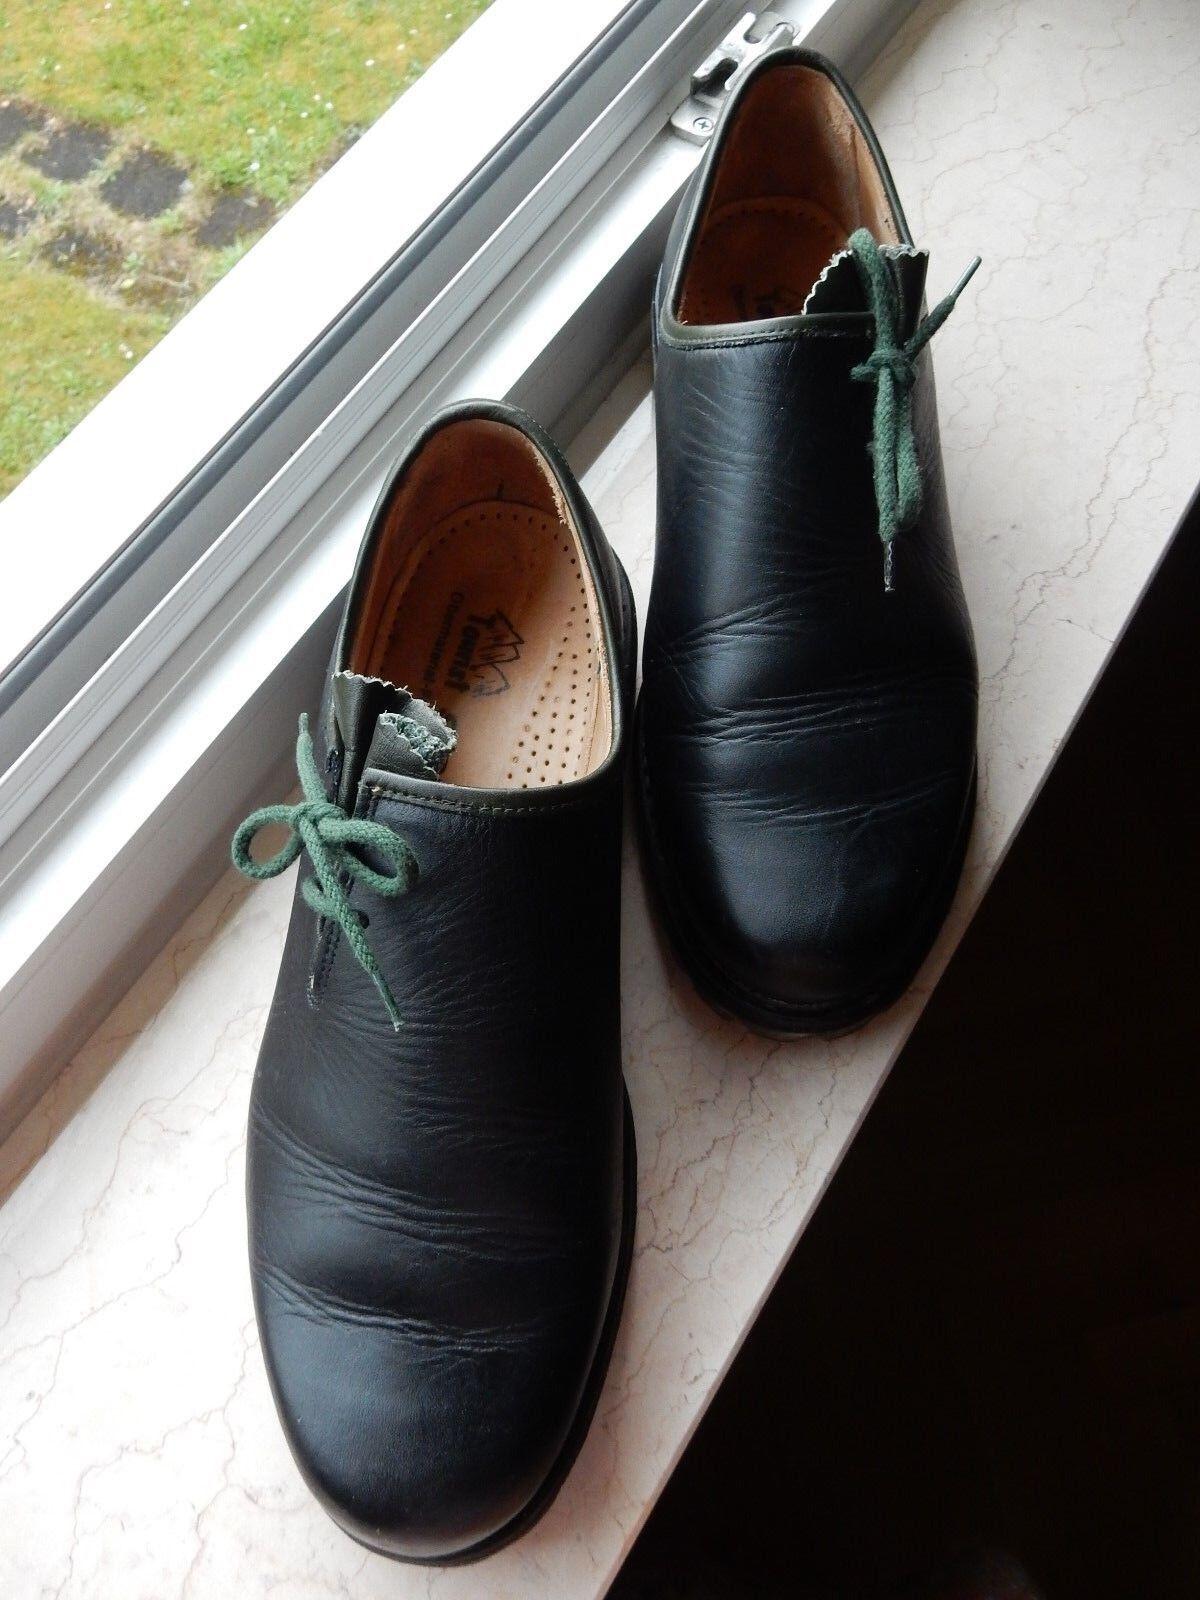 Trachten schwarz/d´grün Schapuro Schnür Schuh Leder schwarz/d´grün Trachten Oktoberfest, wie NEU 9,5 6d5d2d